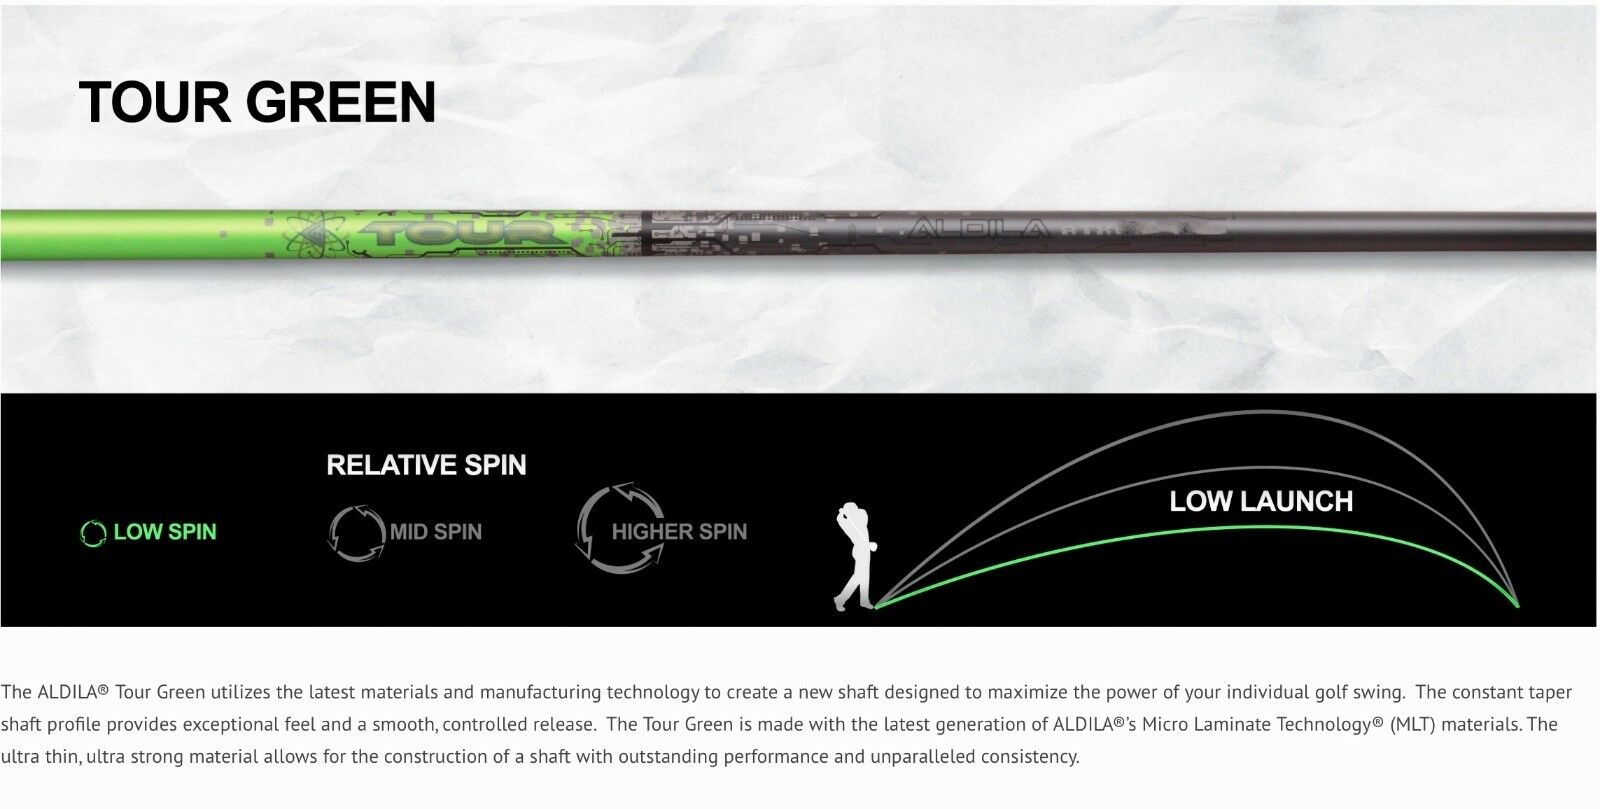 Nuevo Aldila Tour verde  ATX 65 Tour-Eje Rígido Controlador .335 46  S 3.5 Par  Centro comercial profesional integrado en línea.